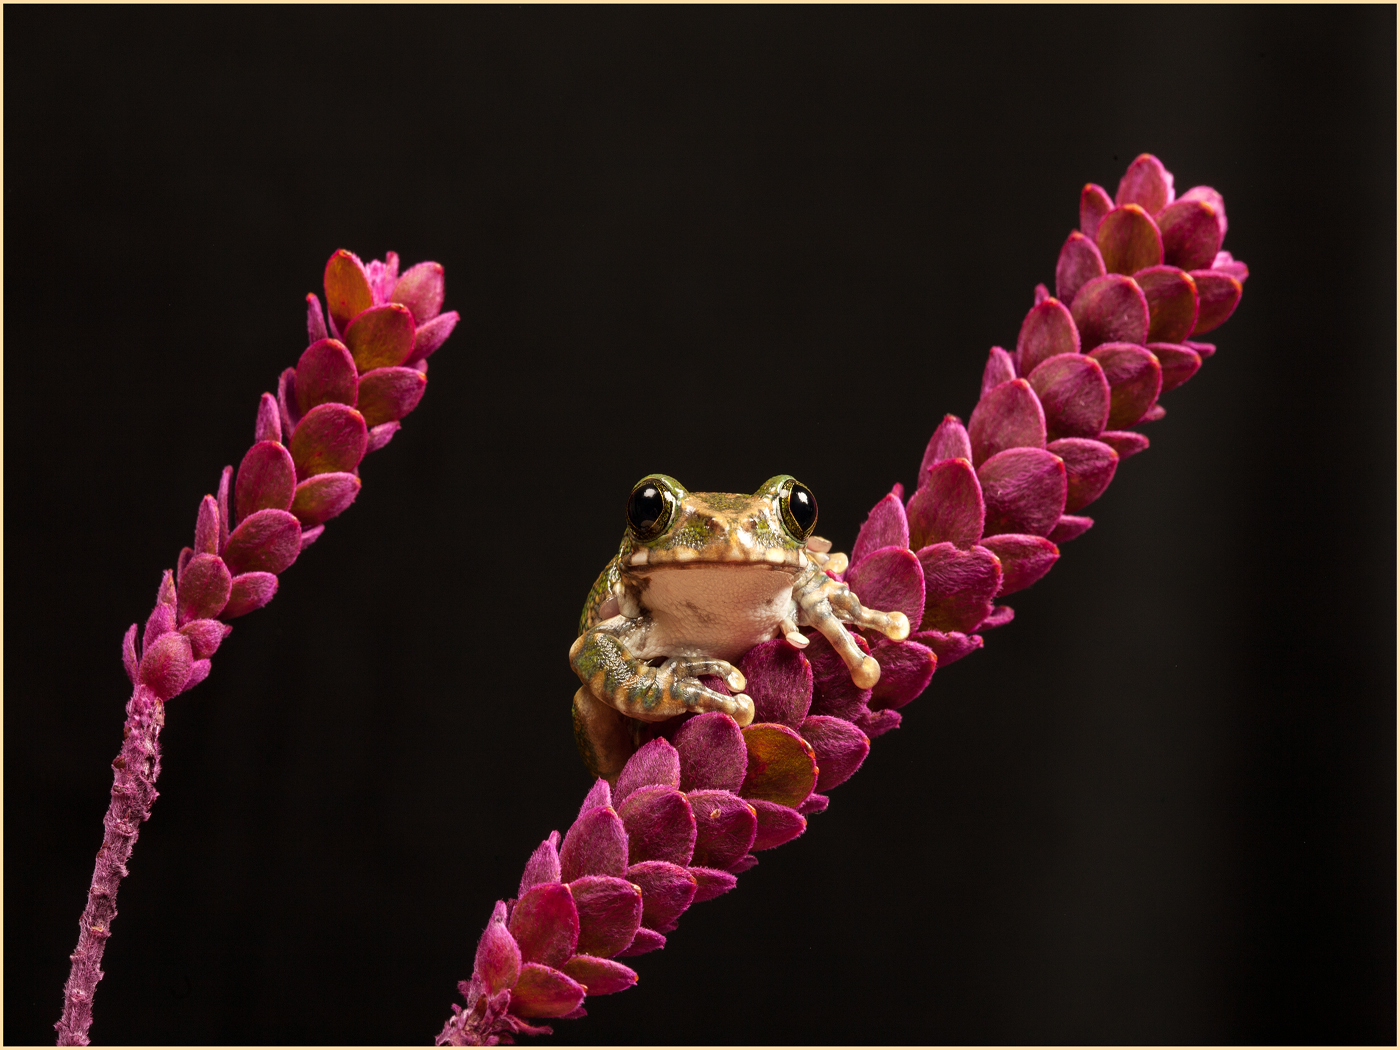 Tree Frog No 45